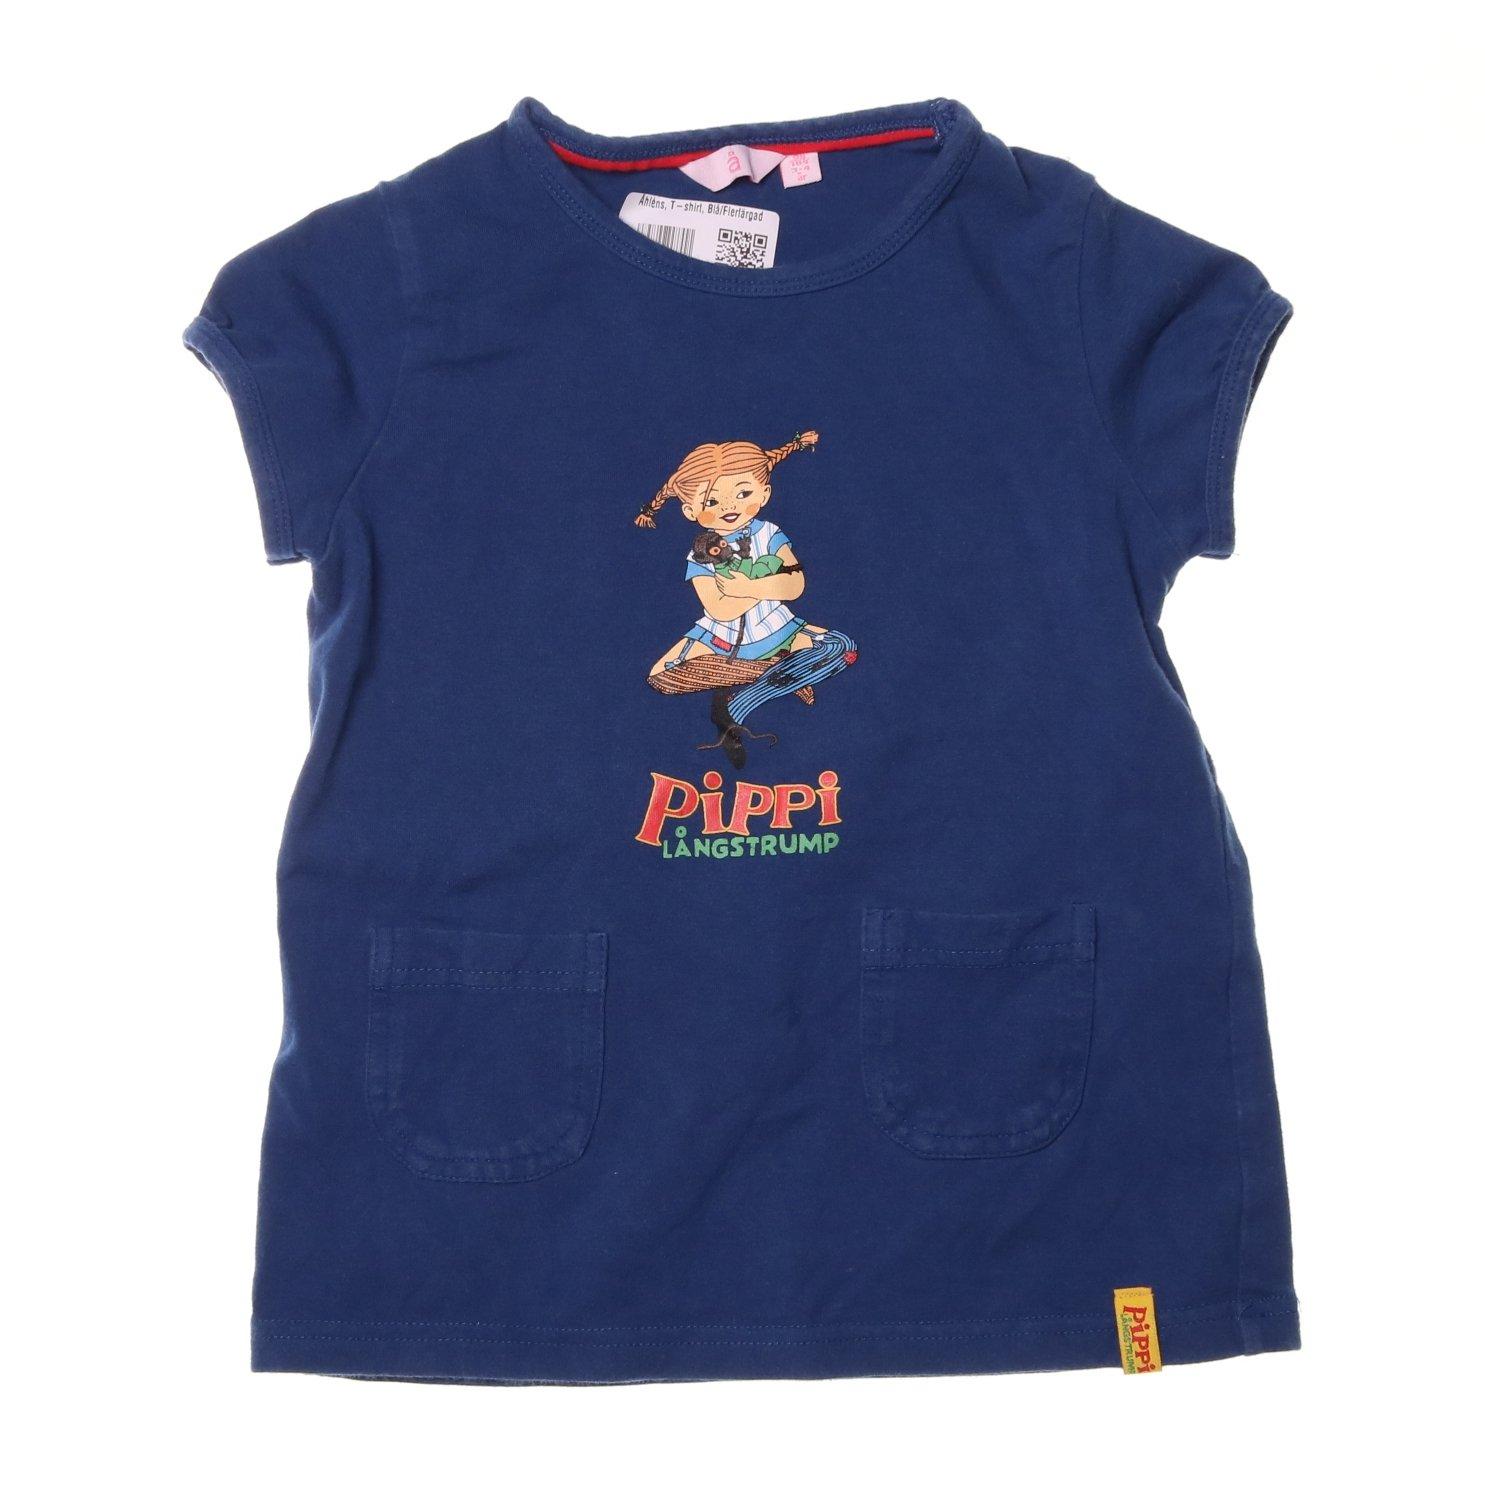 91650d5be60b Åhléns, T-shirt, Strl: 104, Pippi Långstr.. (353400837) ᐈ Sellpy på ...